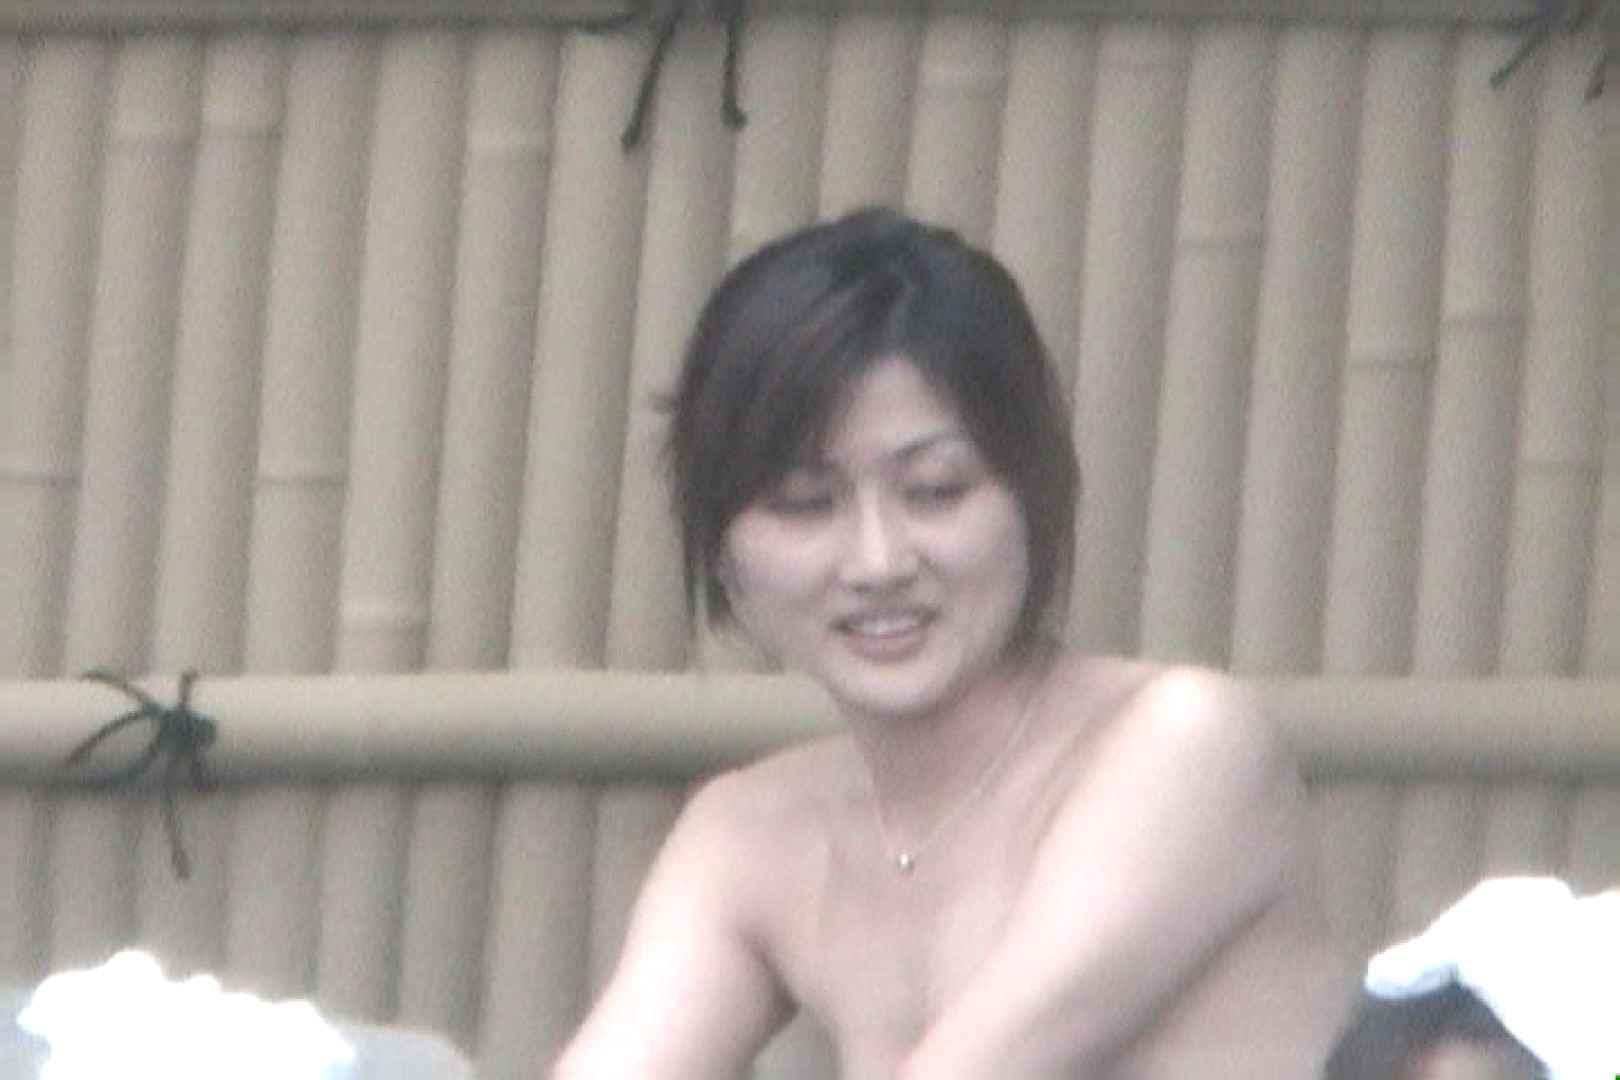 Aquaな露天風呂Vol.553 盗撮師作品 おまんこ無修正動画無料 93pic 17